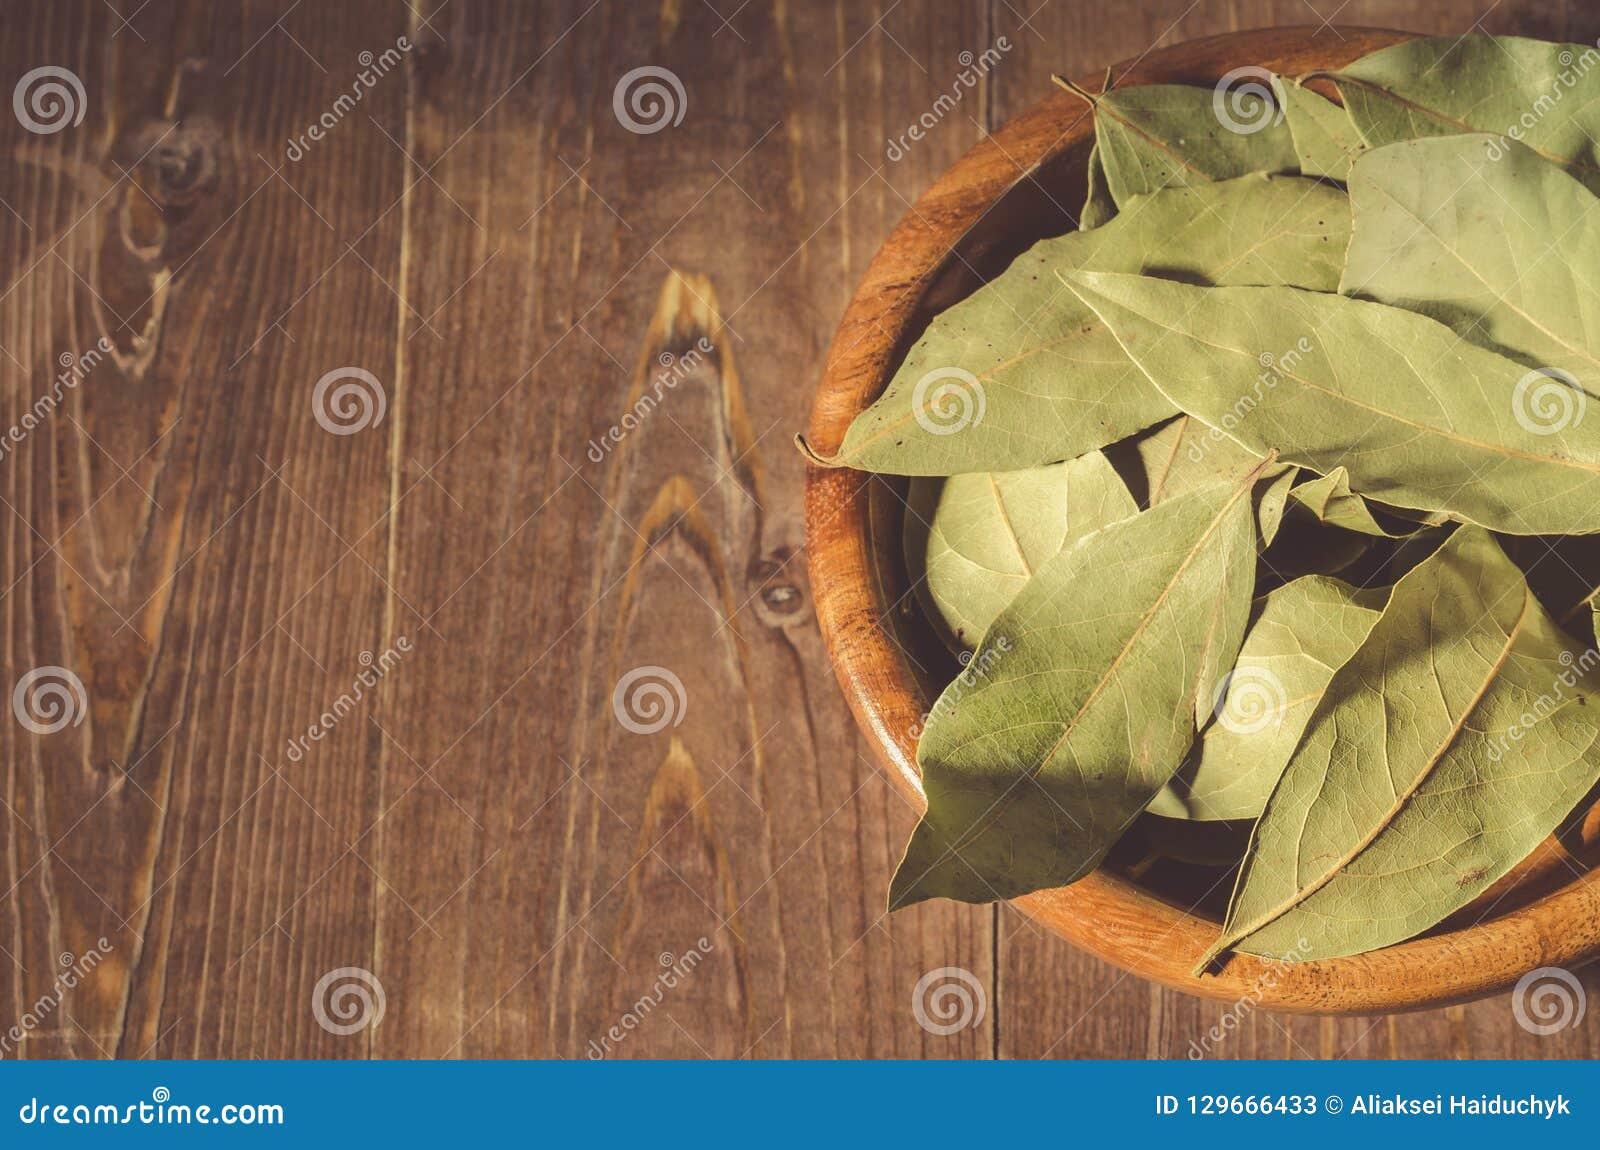 Bay leaf in a wooden bowl/bay leaf in a wooden bowl on a wooden